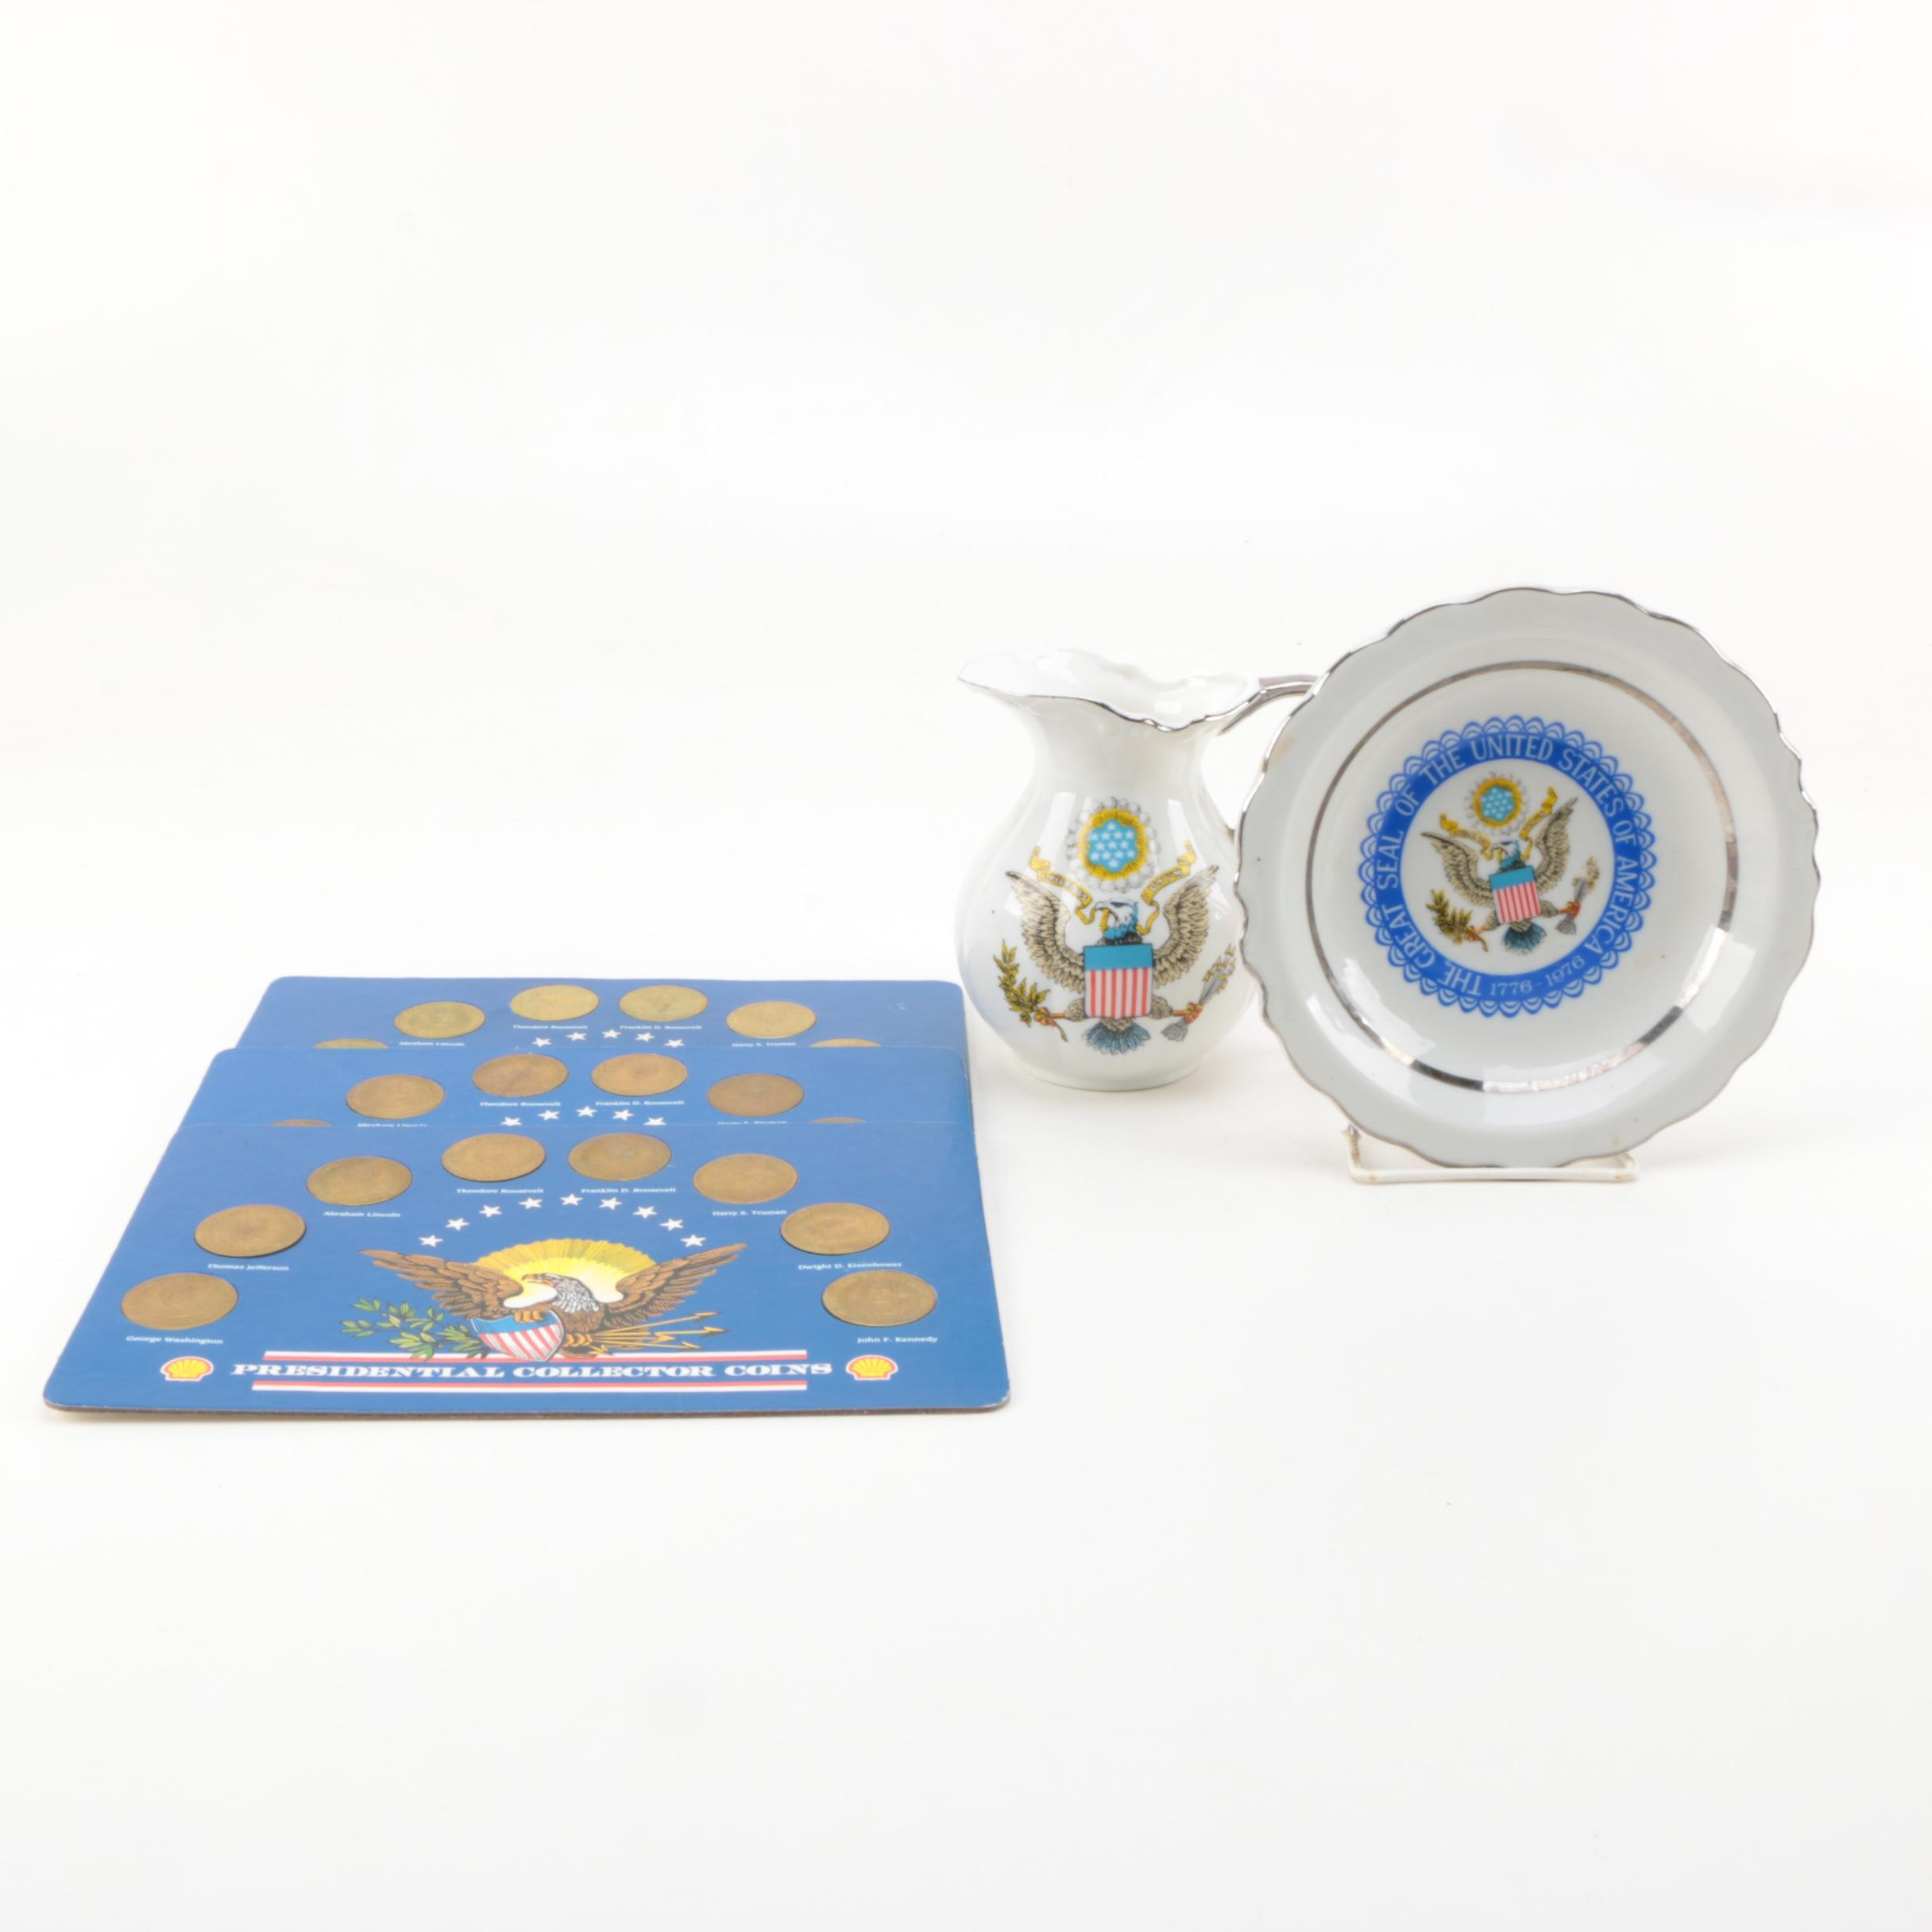 Collection of US Presidential Memorabilia